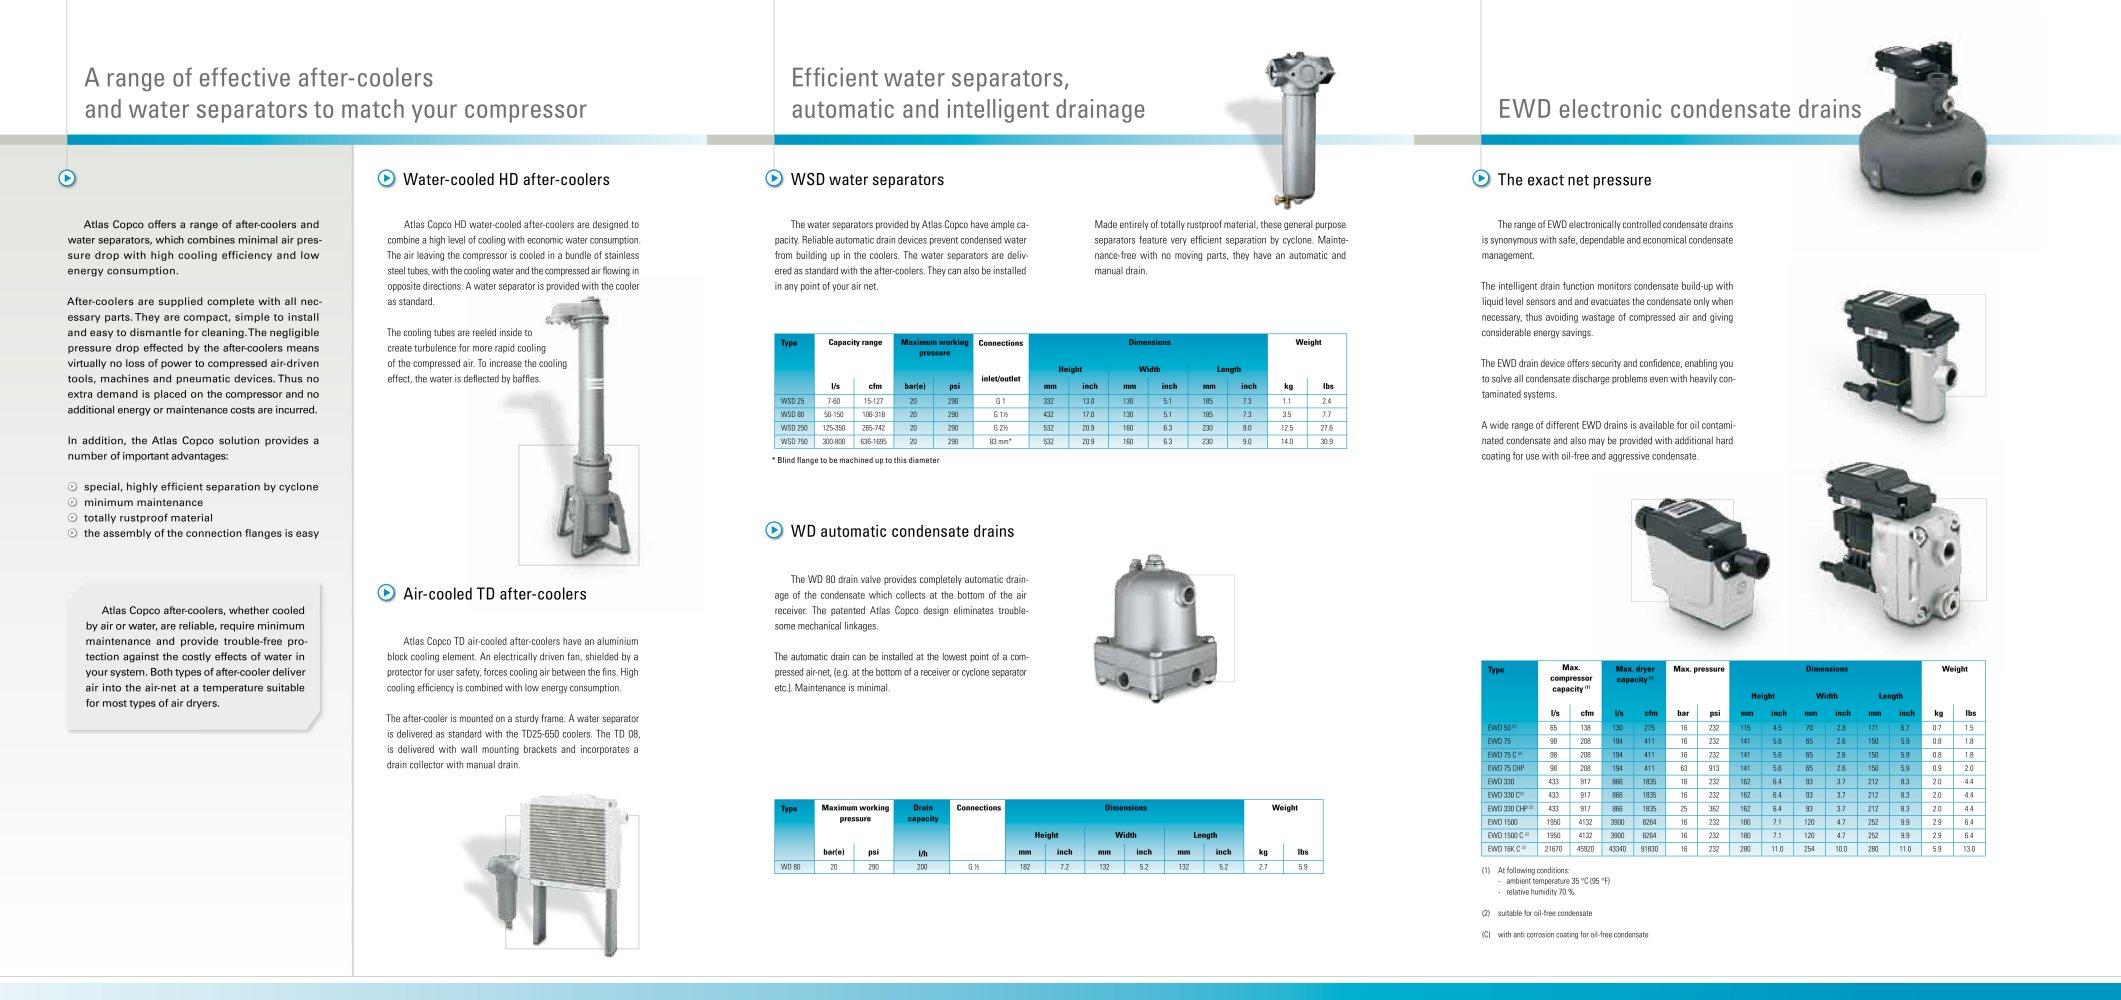 wsd 25 750 wd 80 ewd 50 1500 water separators and drains rh pdf directindustry com atlas copco ewd 330 manual ewd 330 m manual